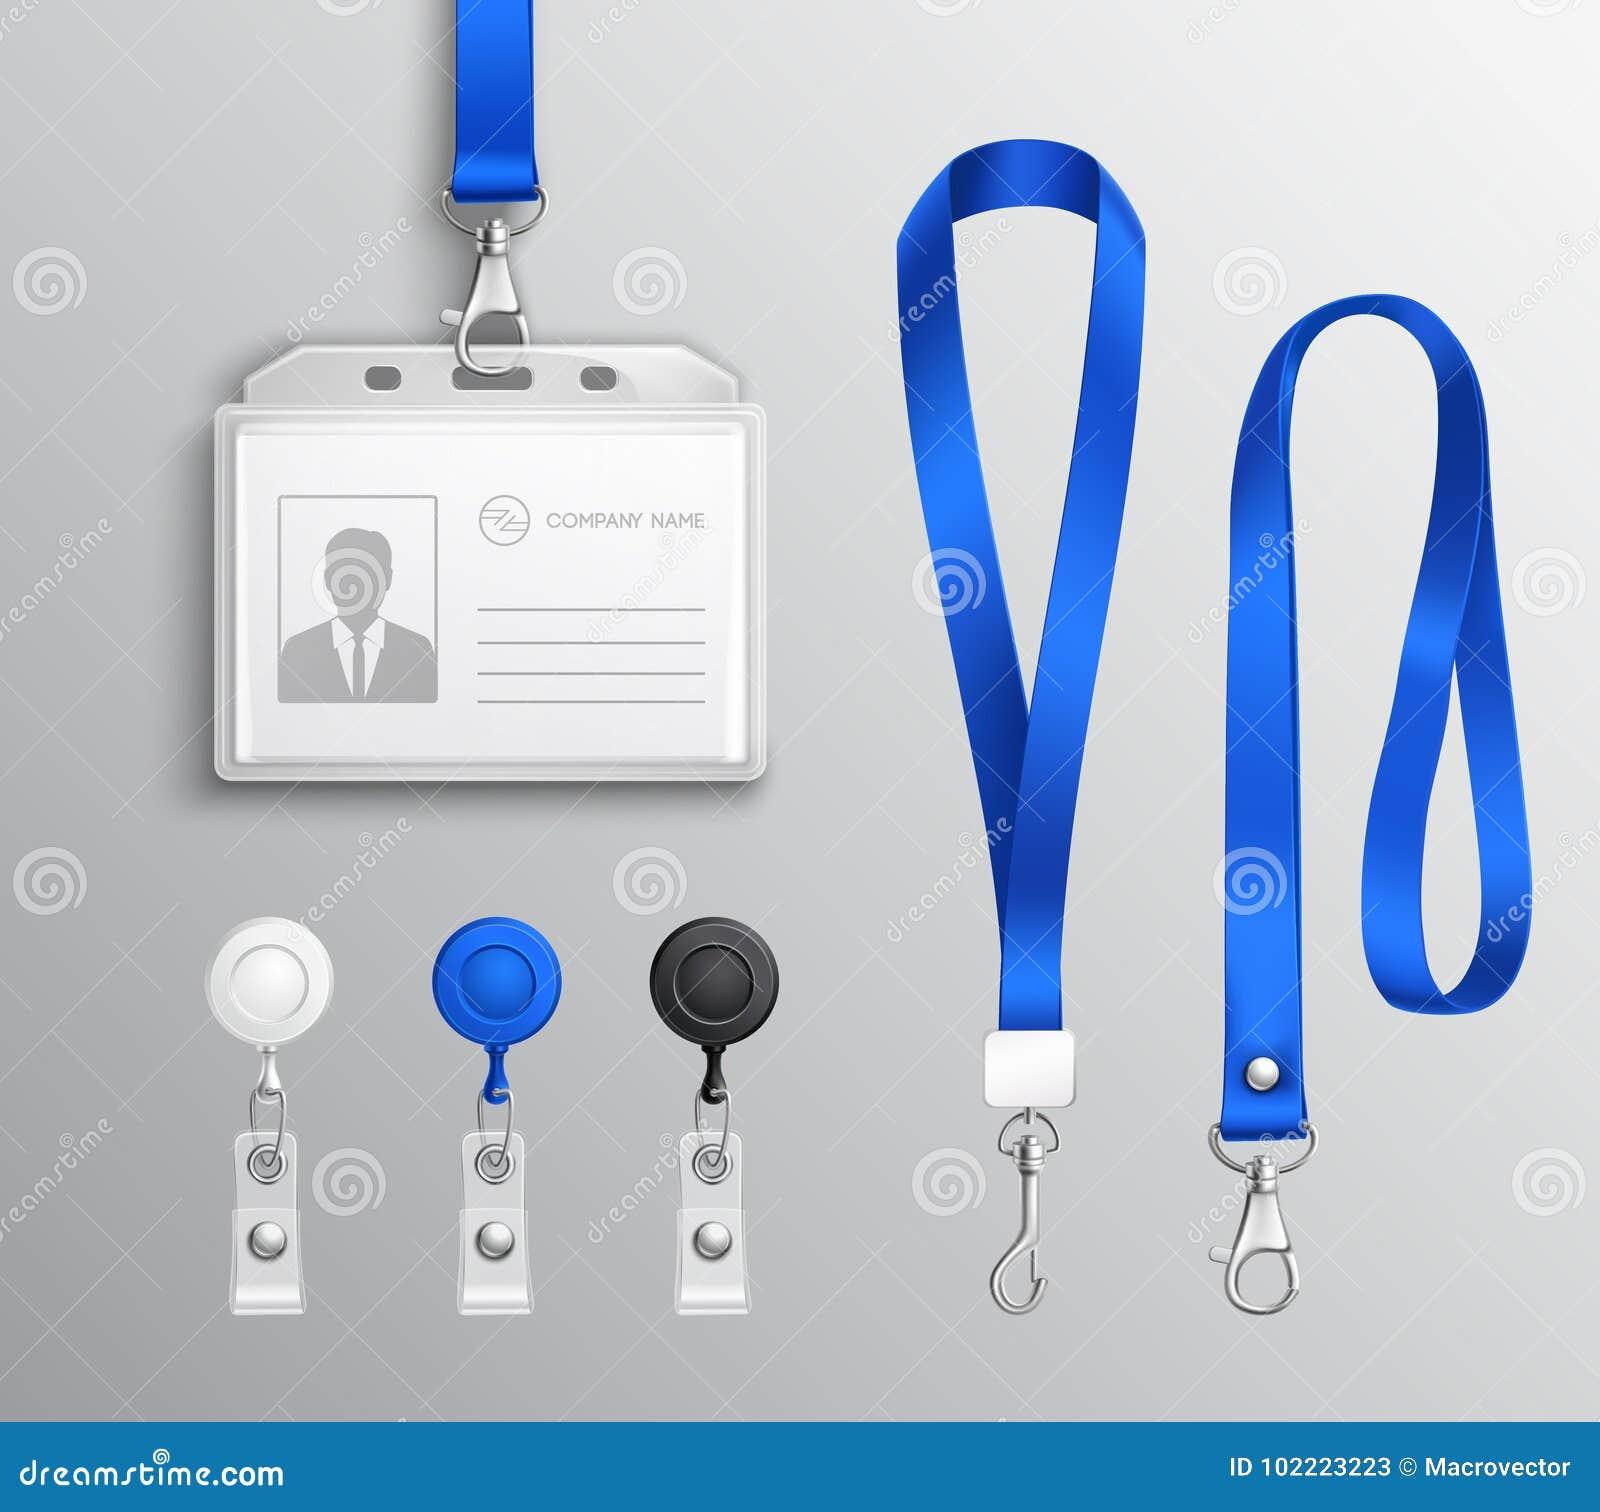 Identification Card Badge Accessories Set Stock Vector Illustration Of Advertisement Black 102223223